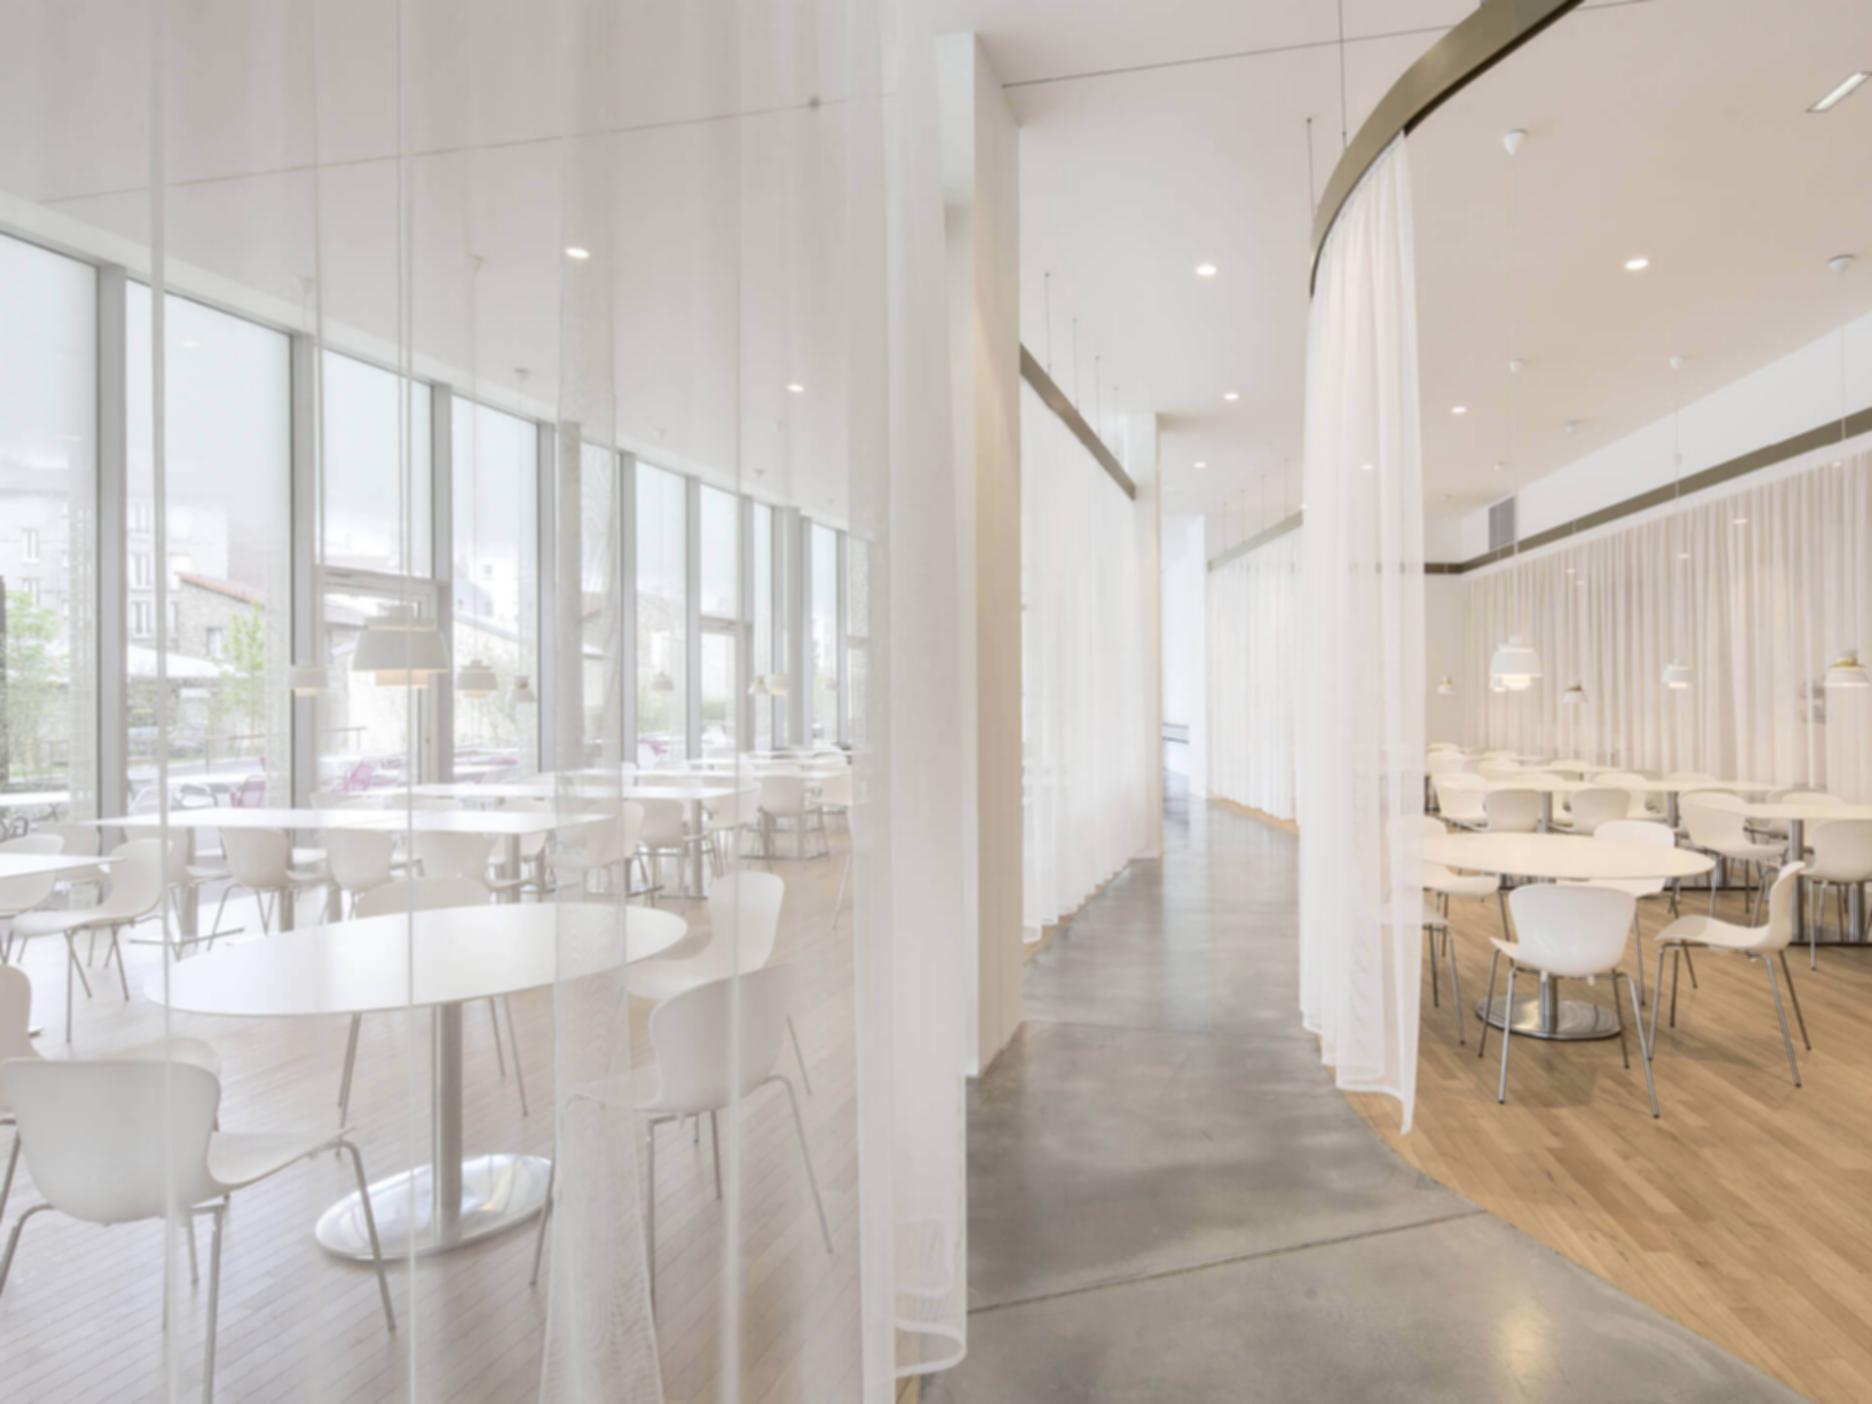 Hachette Livre Headquarters - Interior